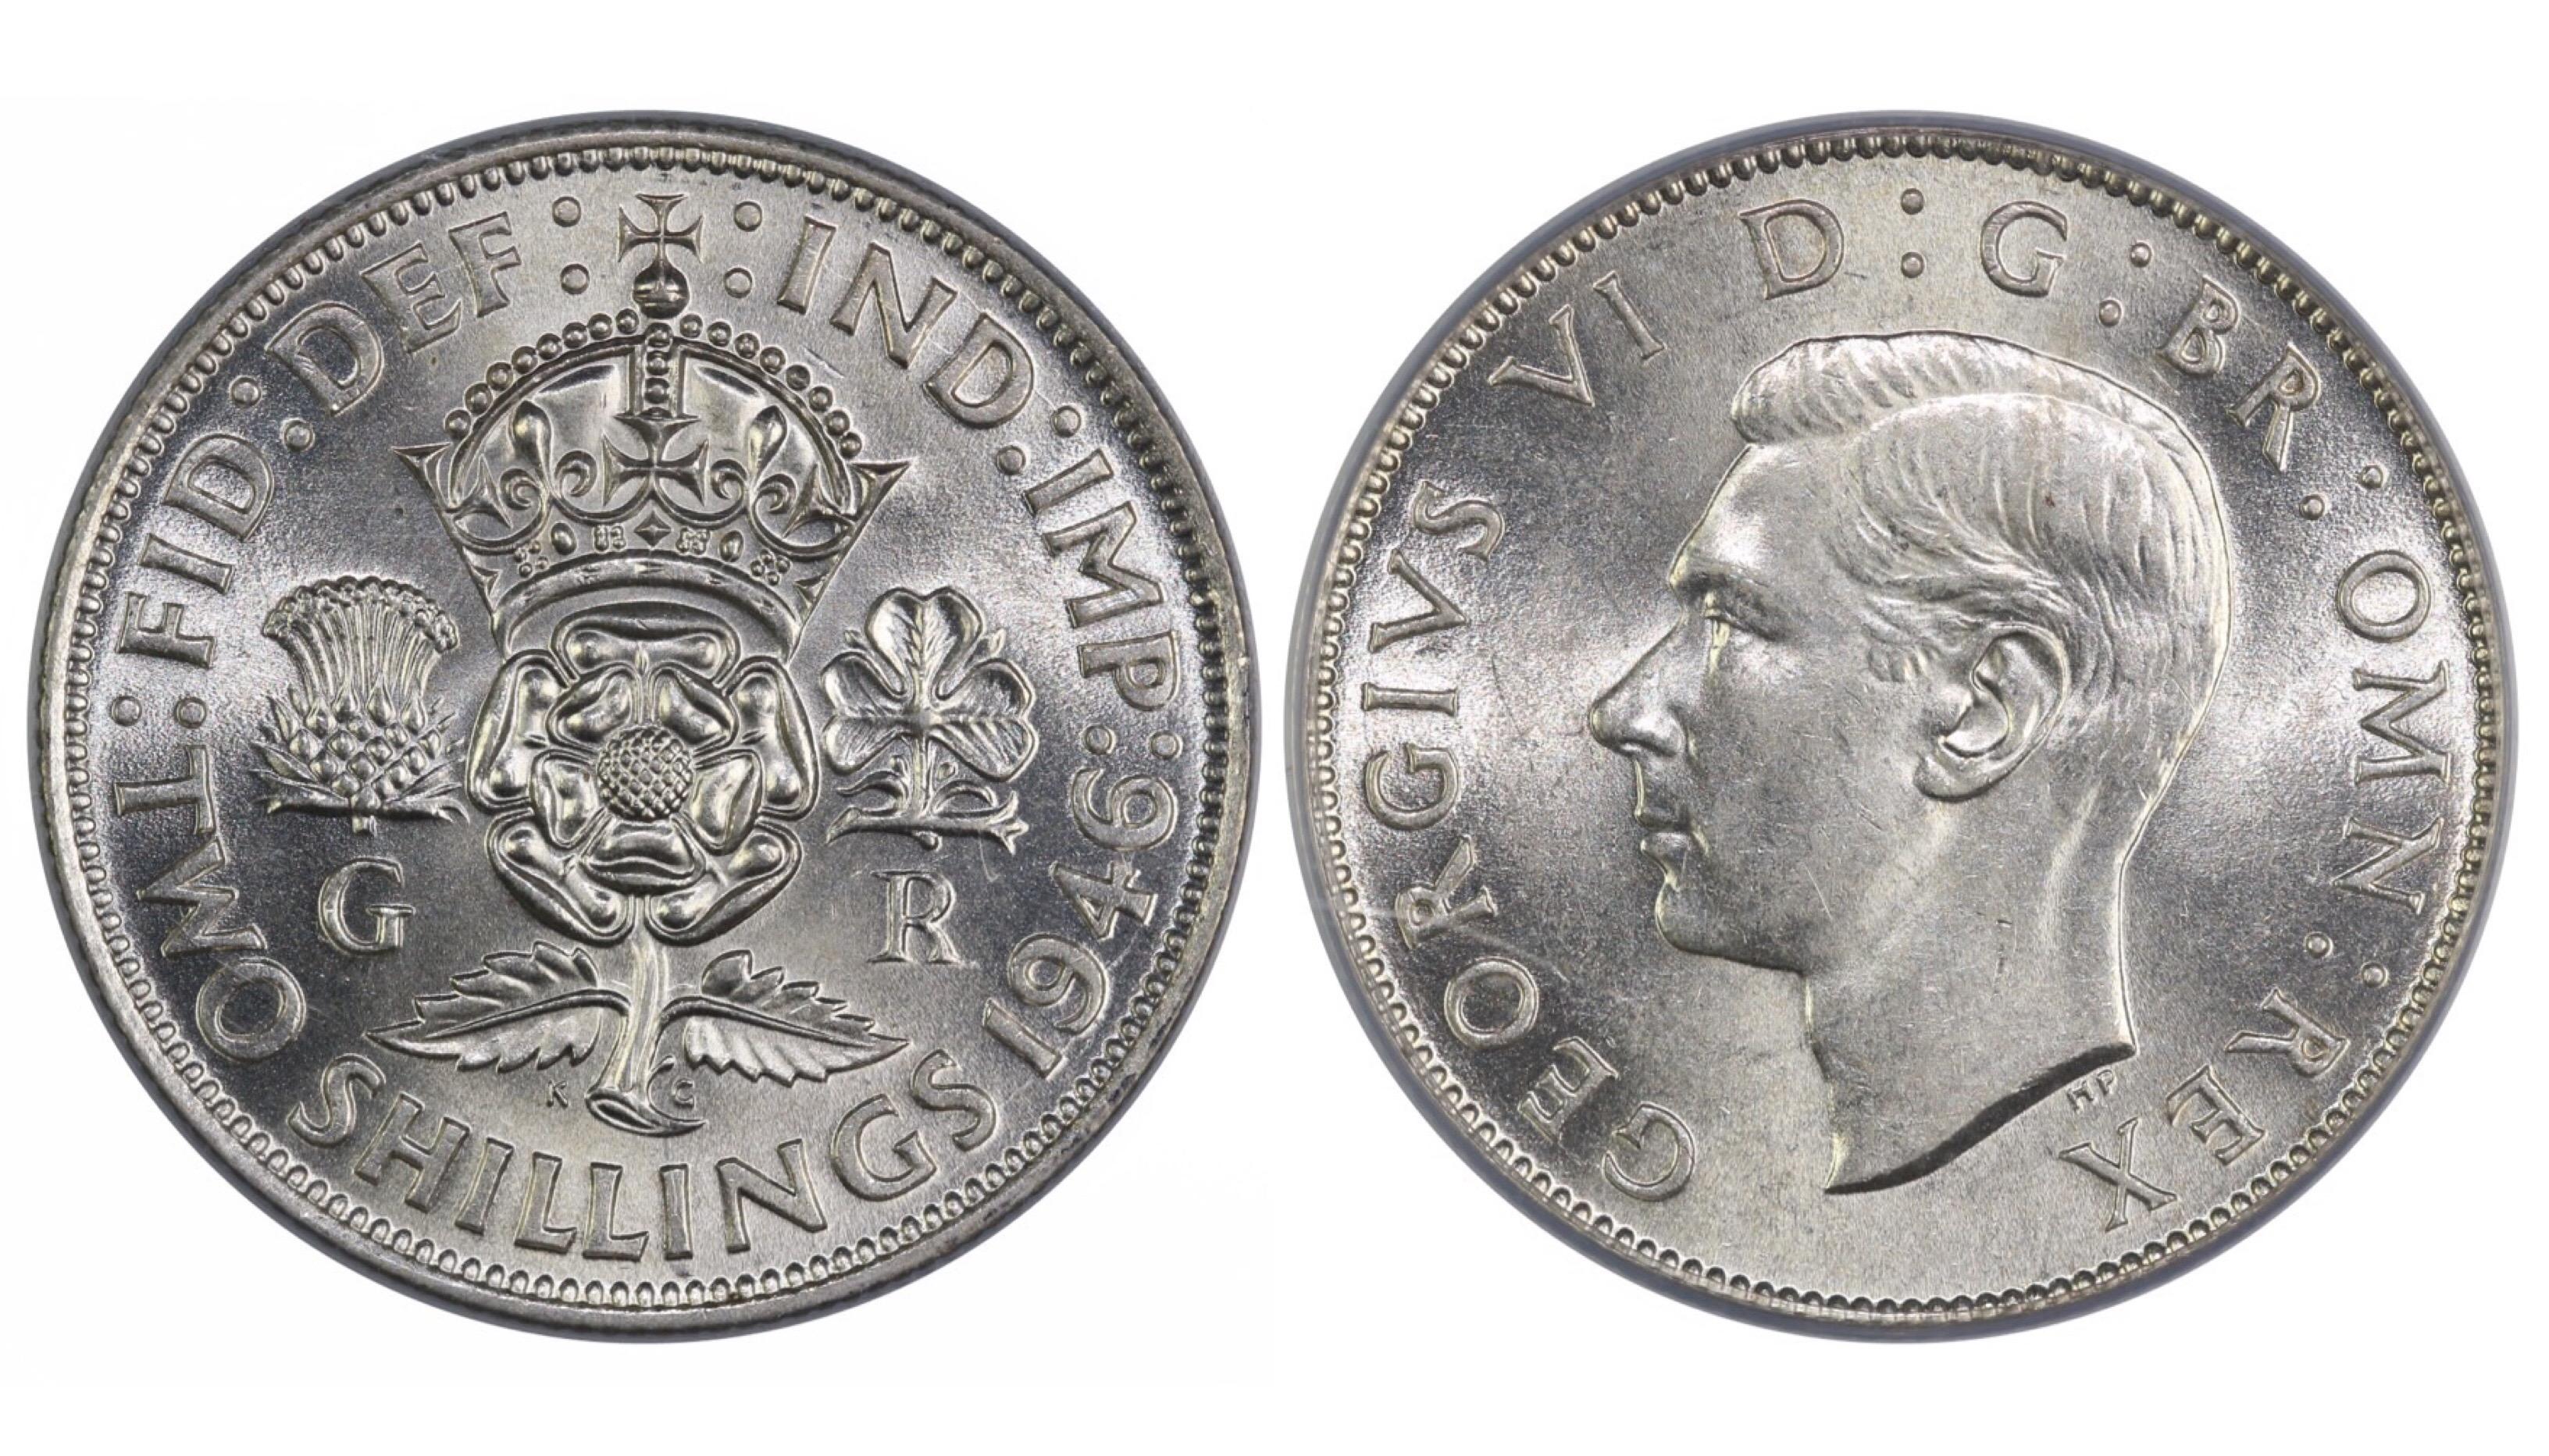 1946 Florin, CGS 78, UNC, George VI, ESC 966, UIN 12489